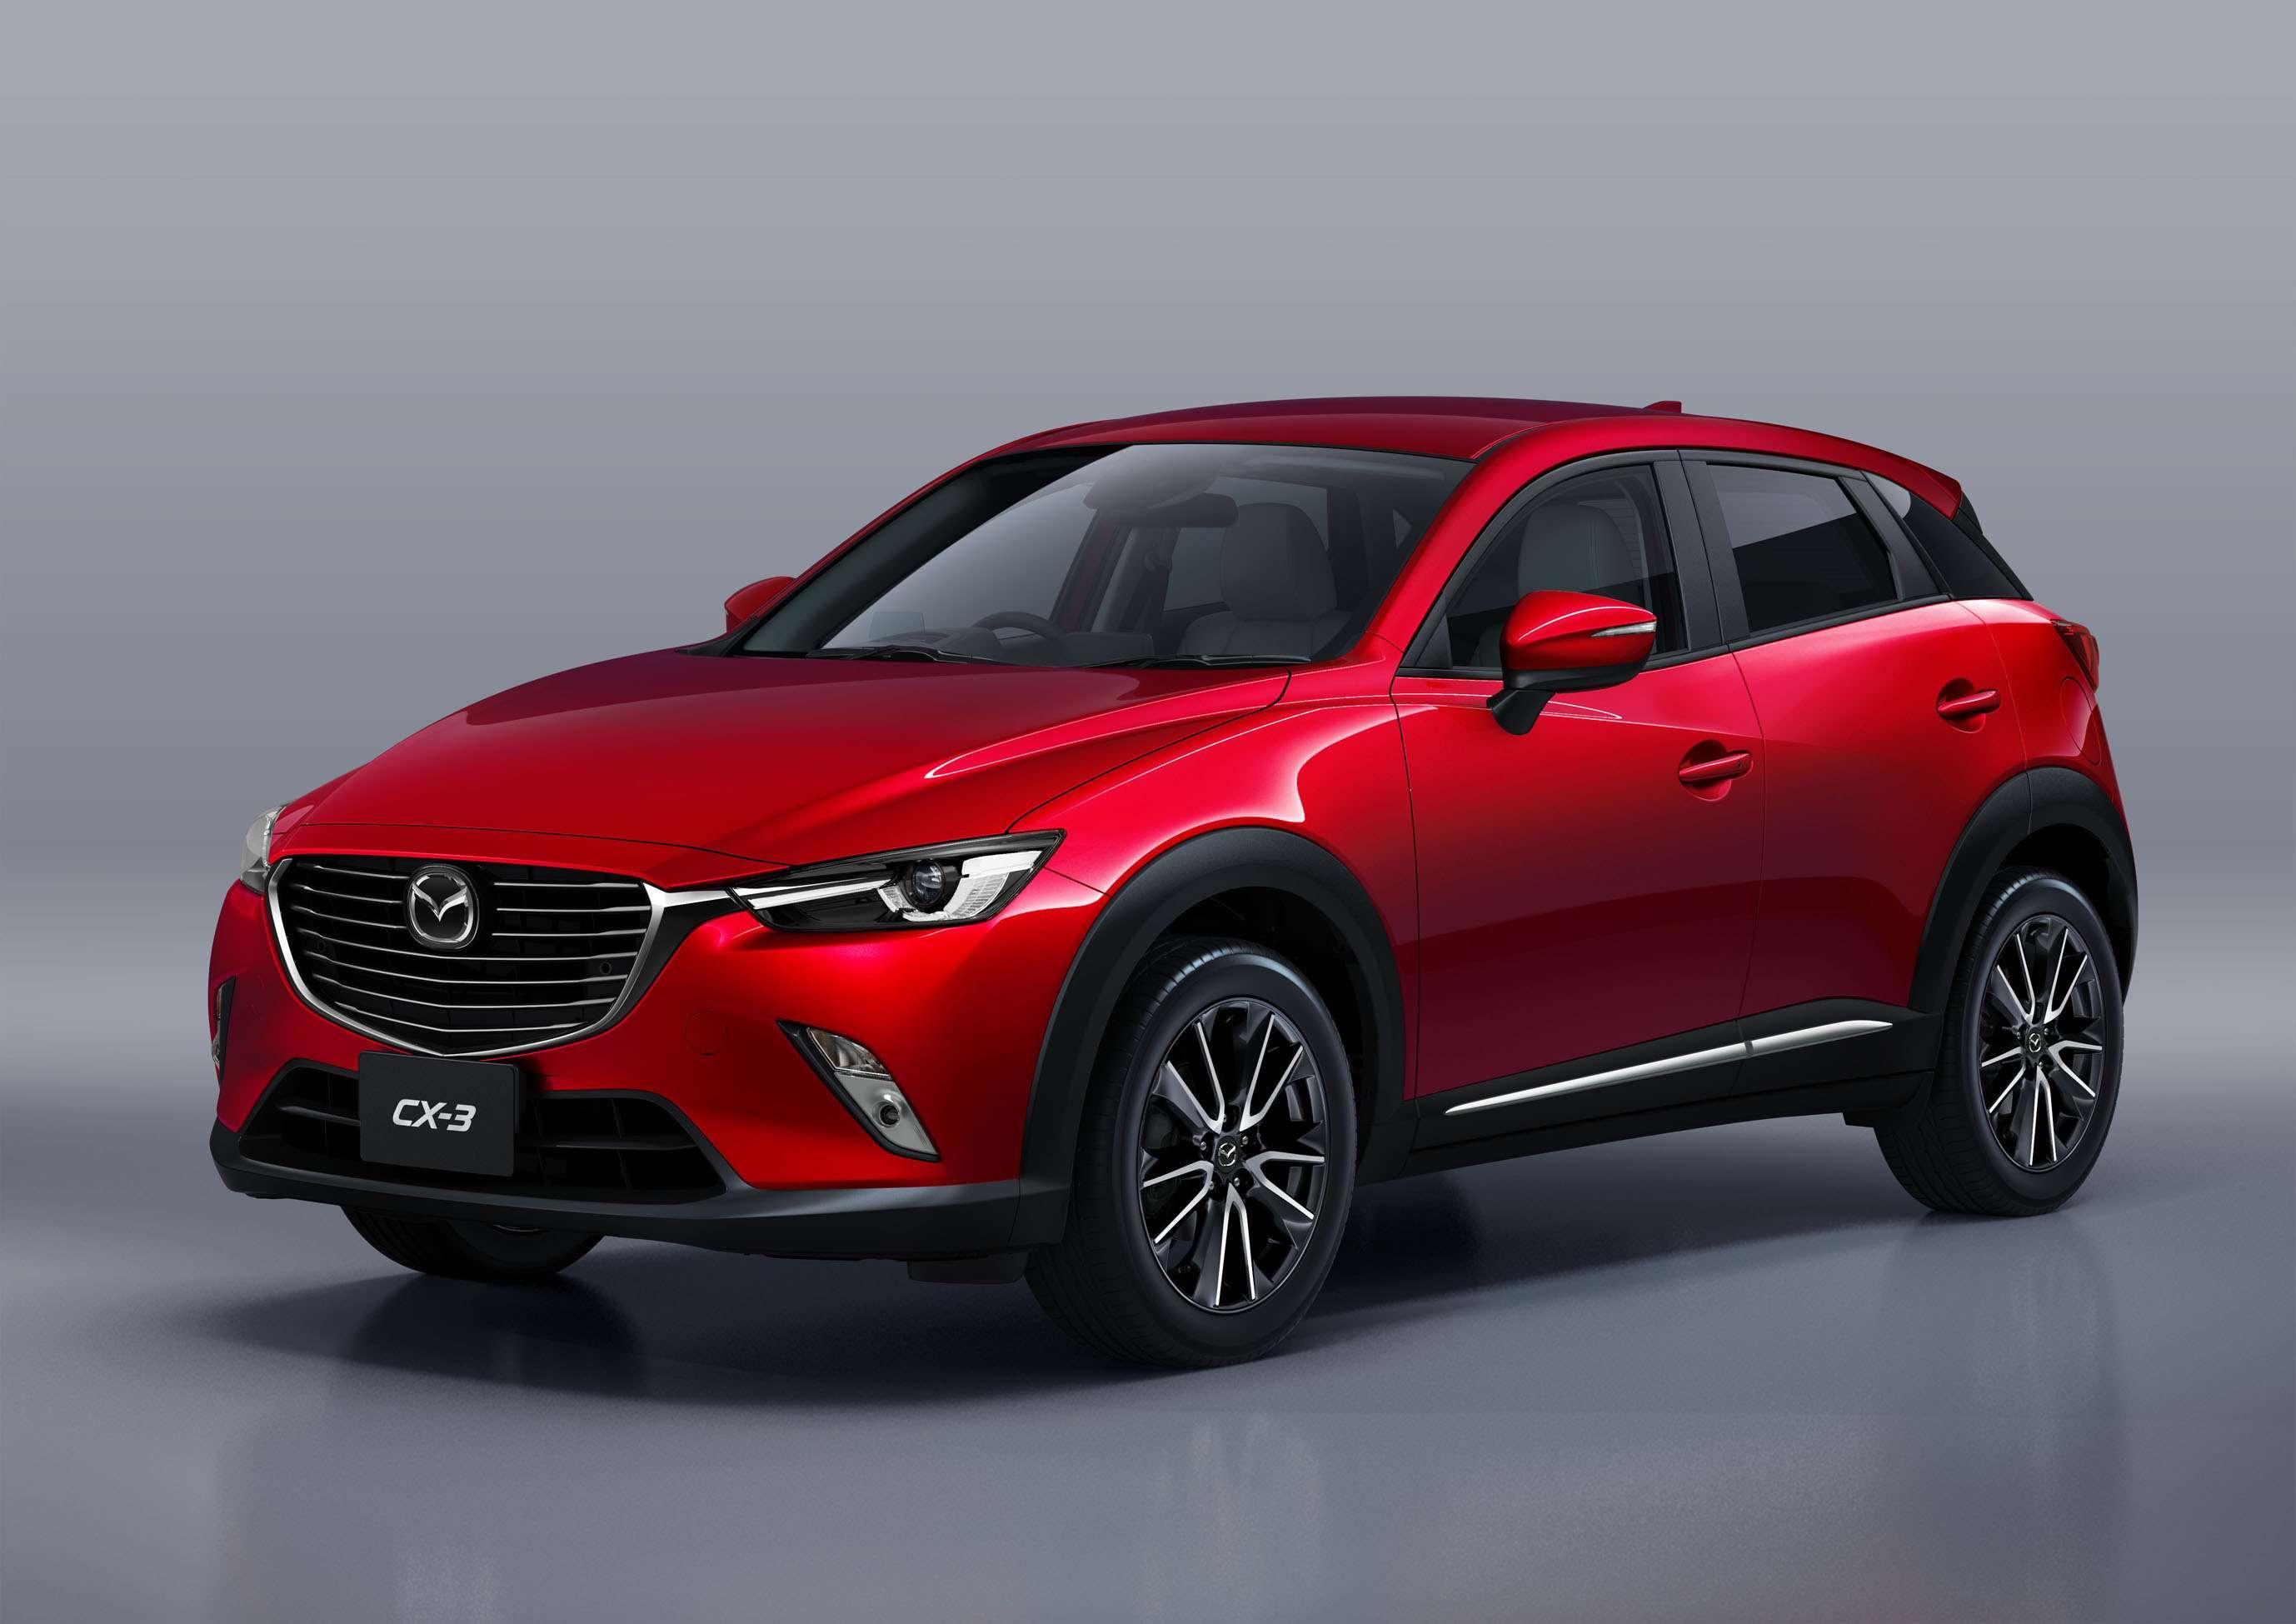 Японские штучки: Mazda CX-3и Demio срочно обновились— фото 650006